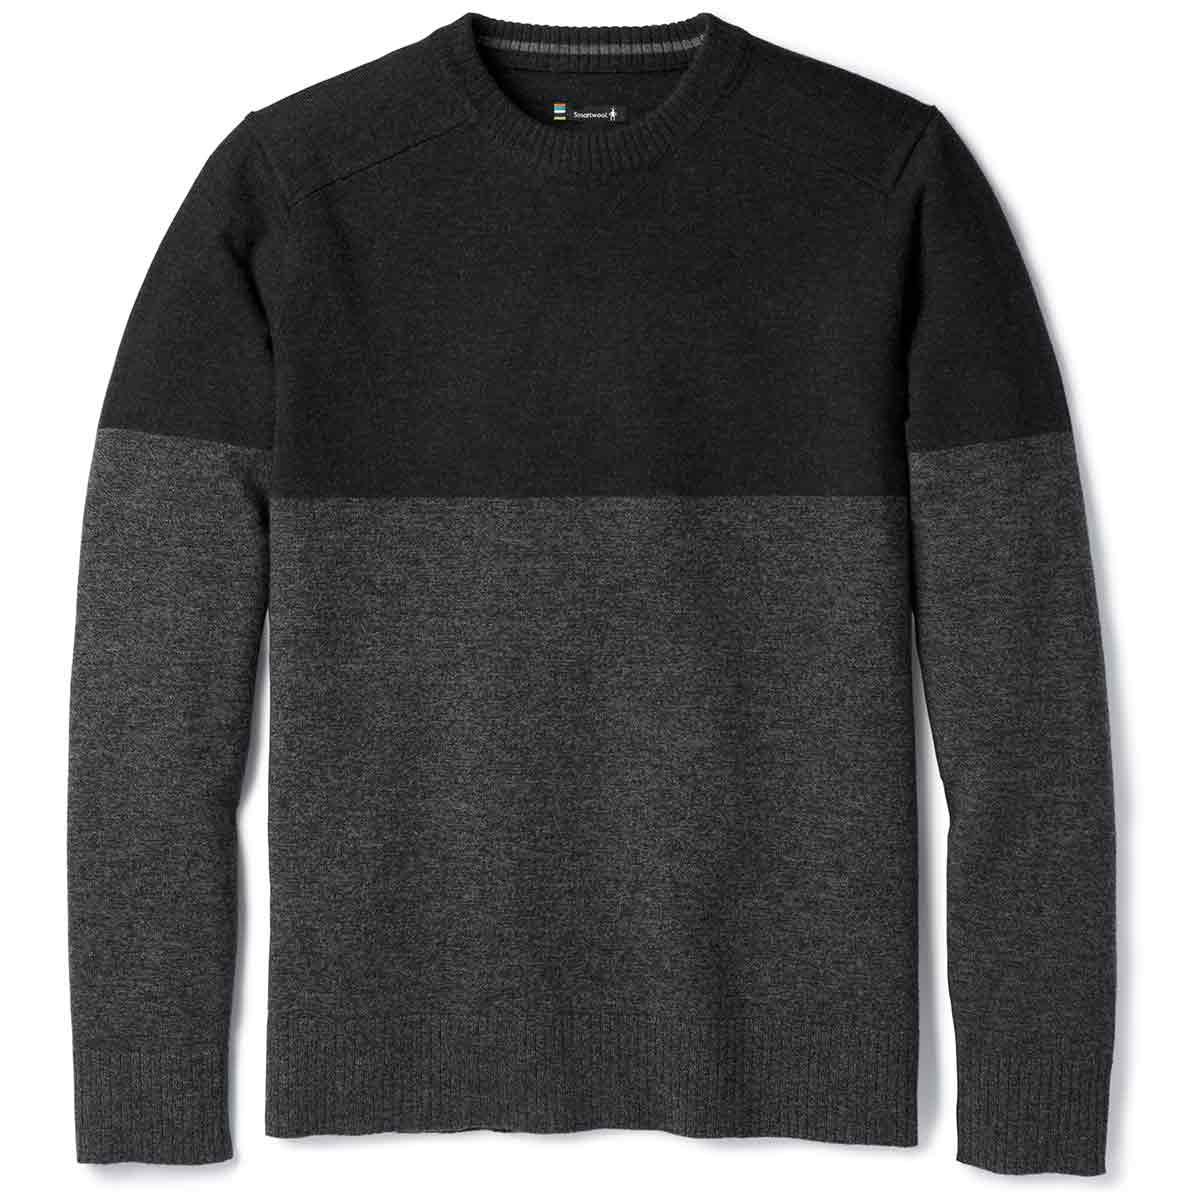 Smartwool Men's Sparwood Colorblock Crew Sweater - Black, S